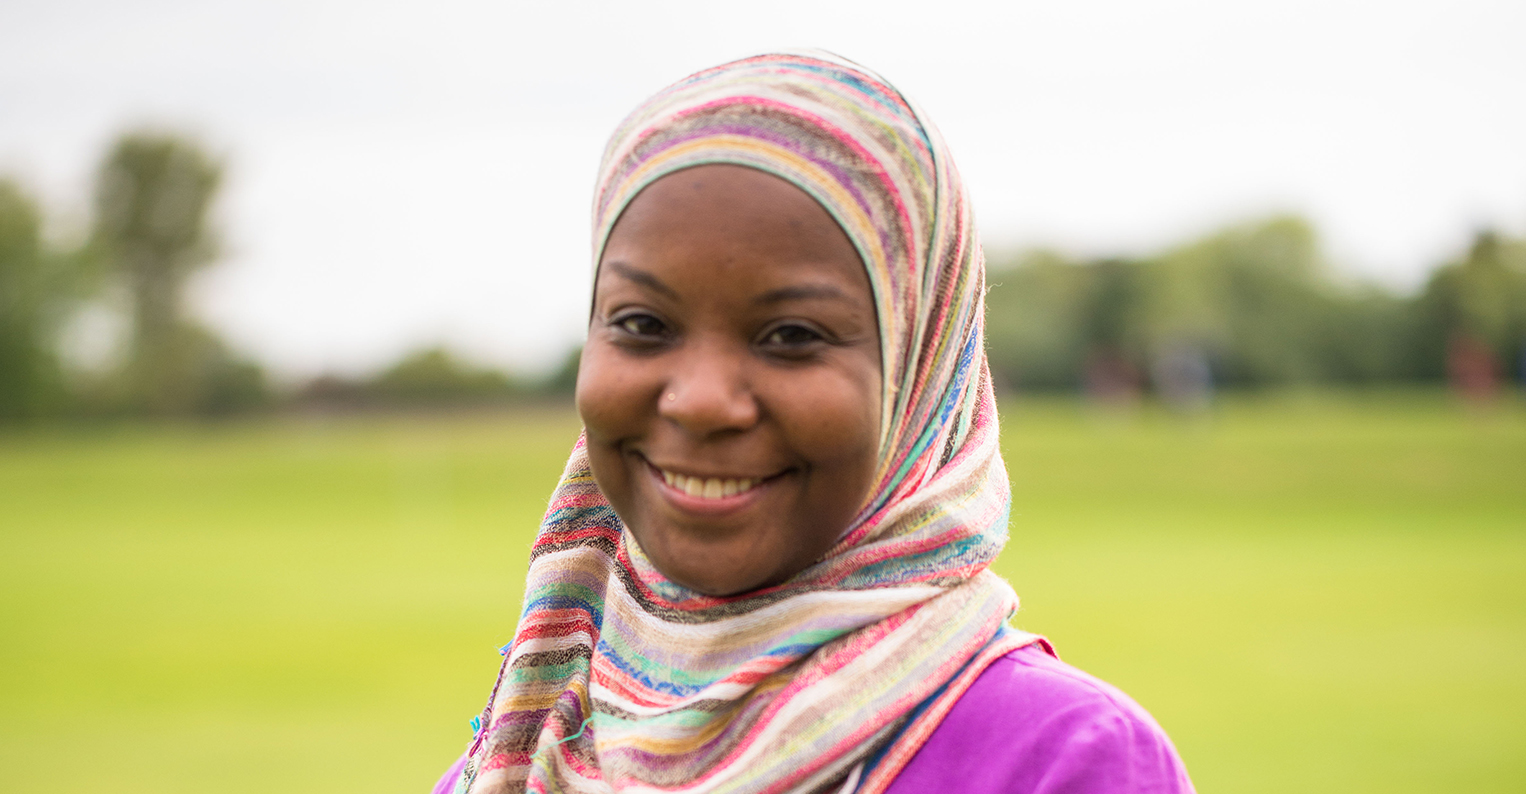 Kameelah Mu'Min Rashad - The Ariane de Rothschild Fellowship